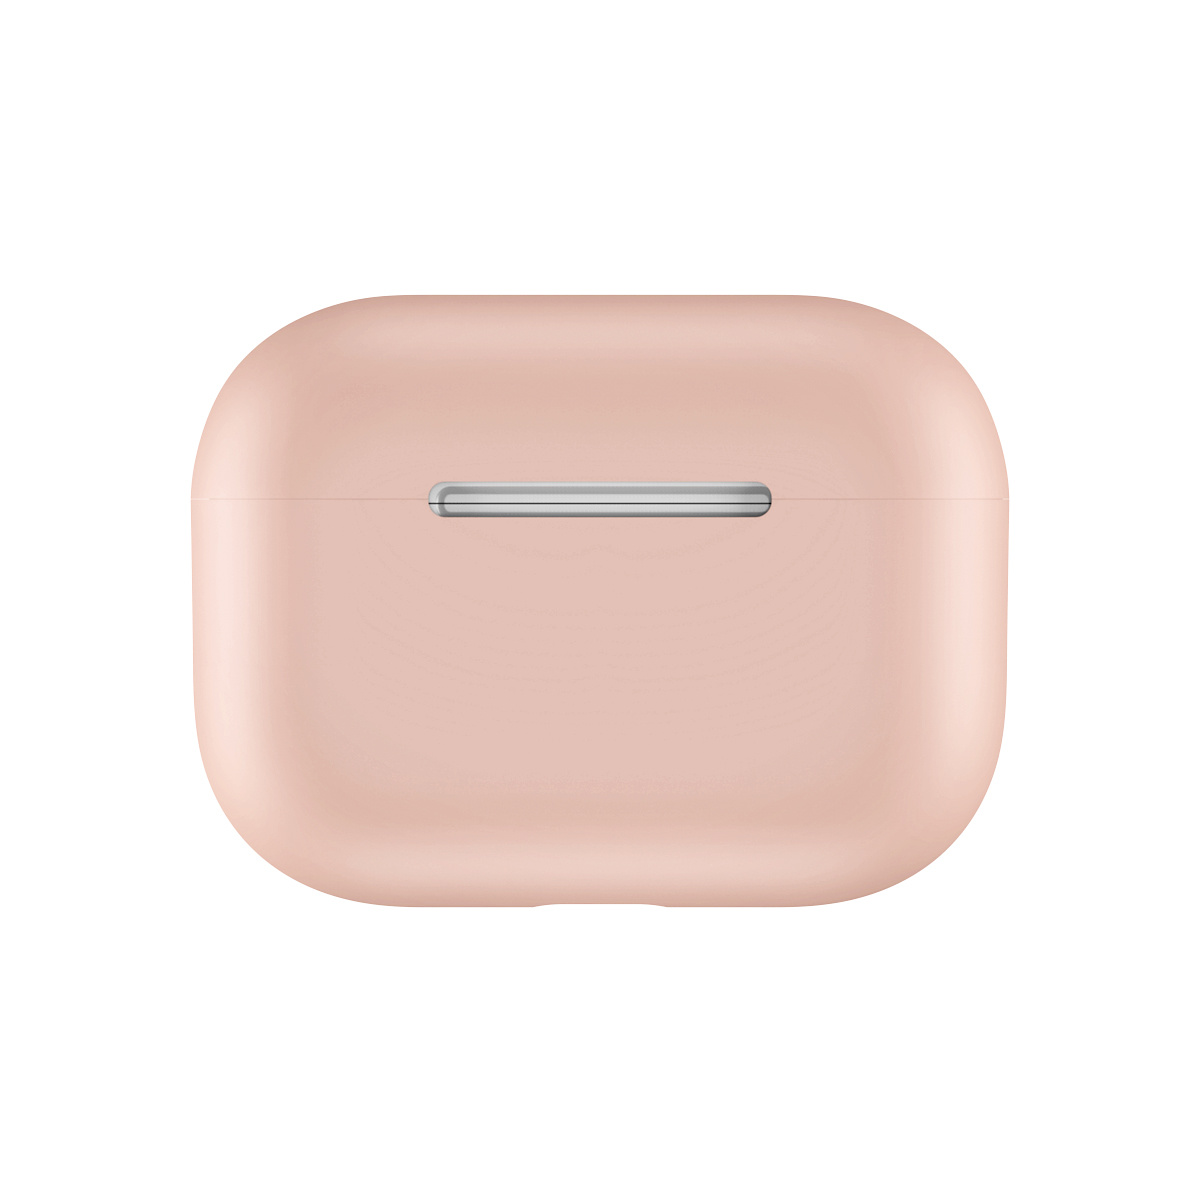 Ultratunt skyddsfodral i silikon till Airpod Pro, rosa